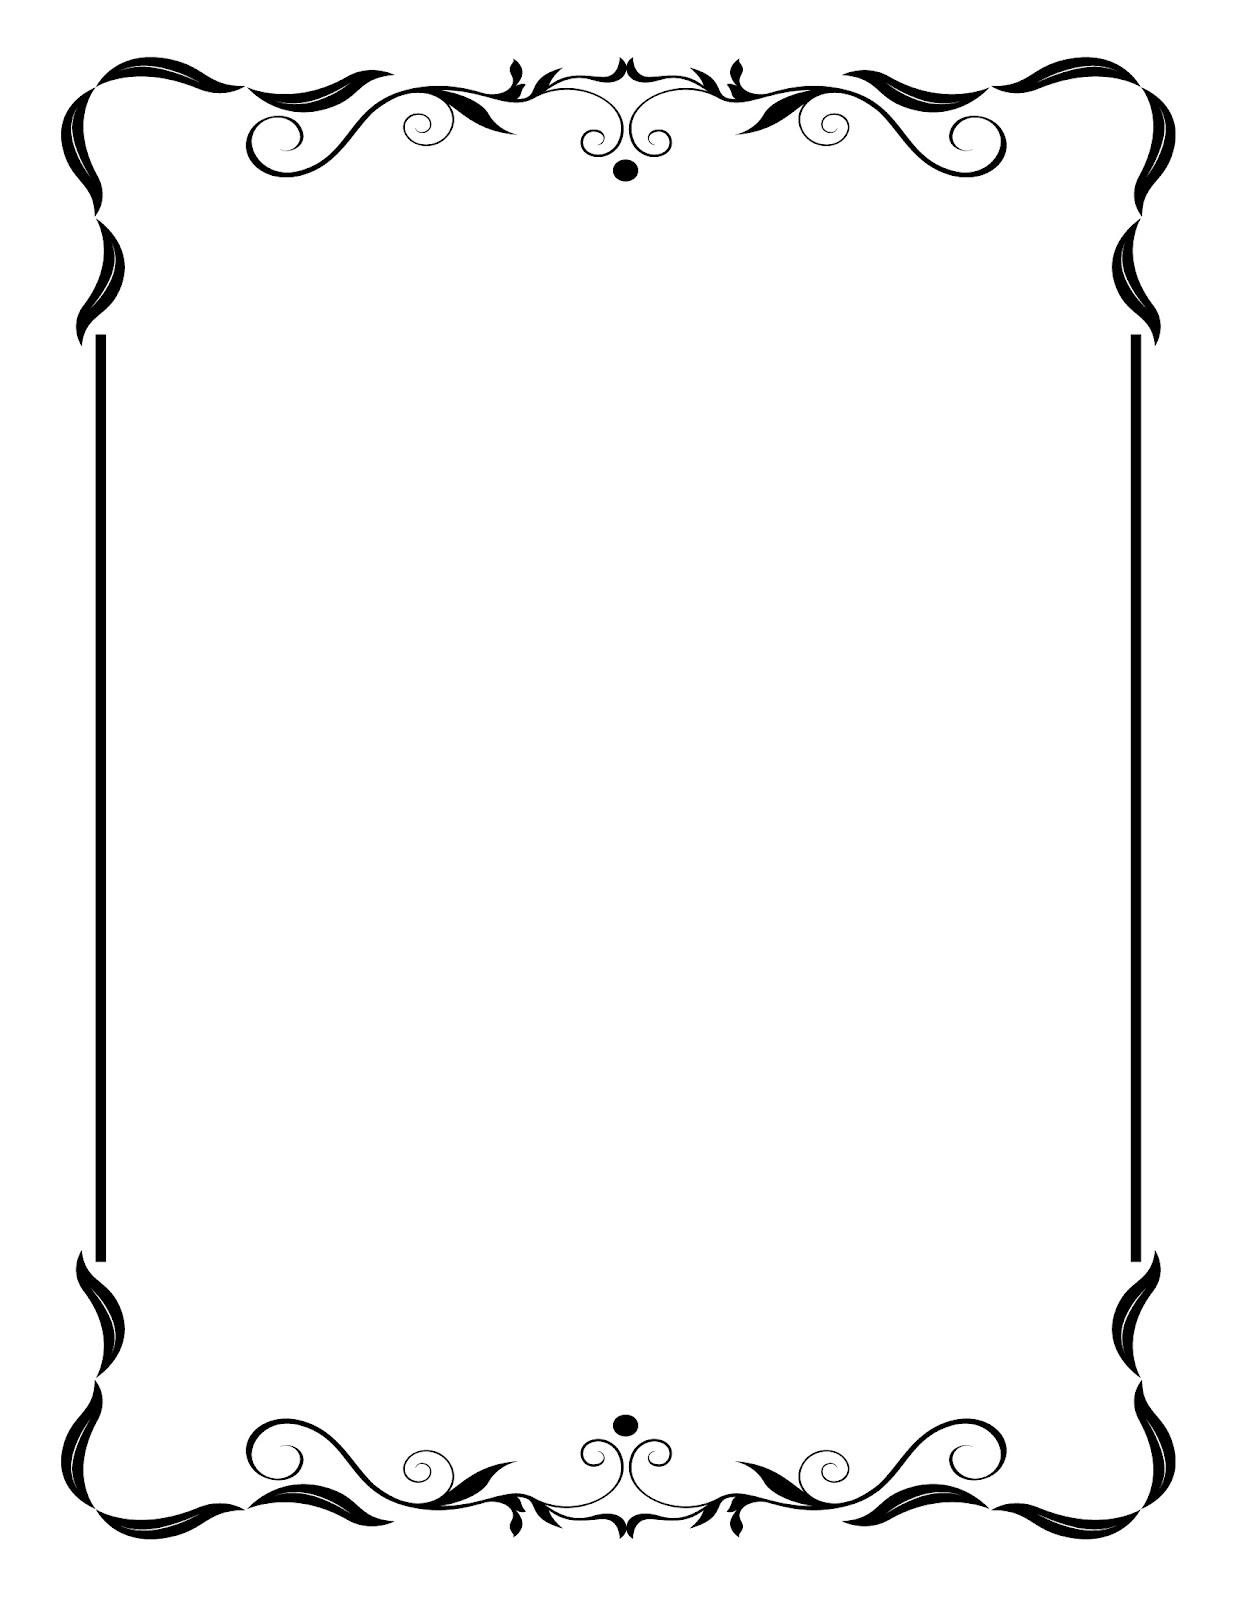 Clipart borders. Wedding free ideal vistalist